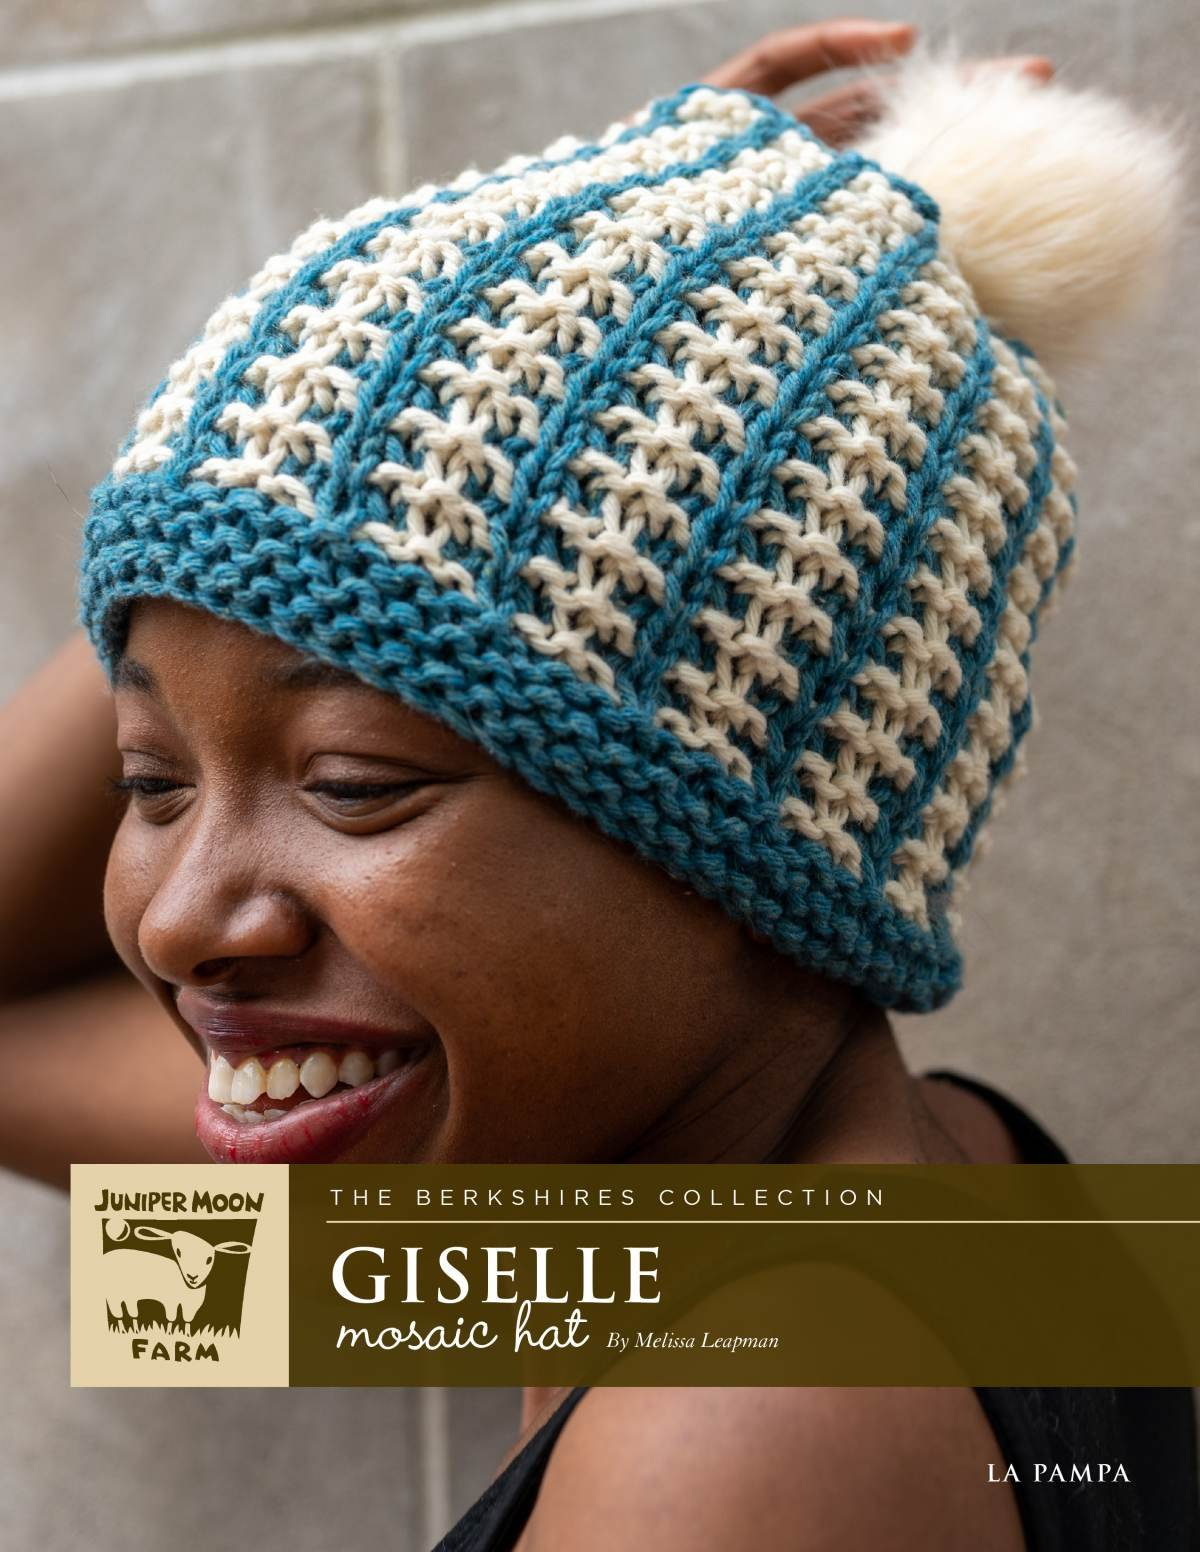 Giselle Mosaic Hat pattern